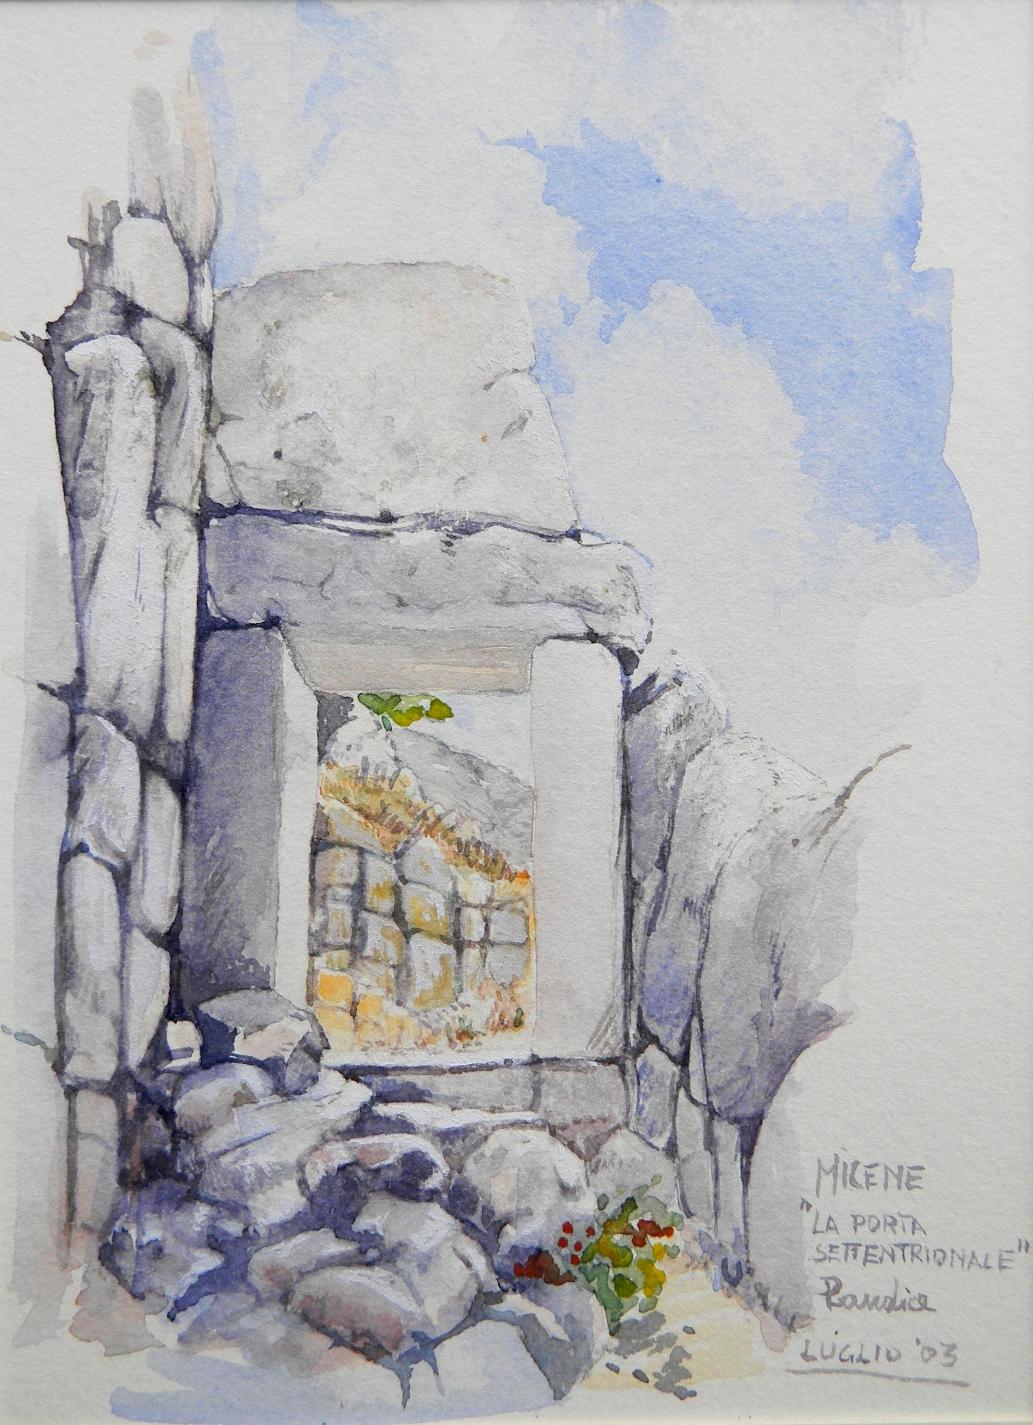 Vincenzo Paudice - Micene, Ingresso settentrionale